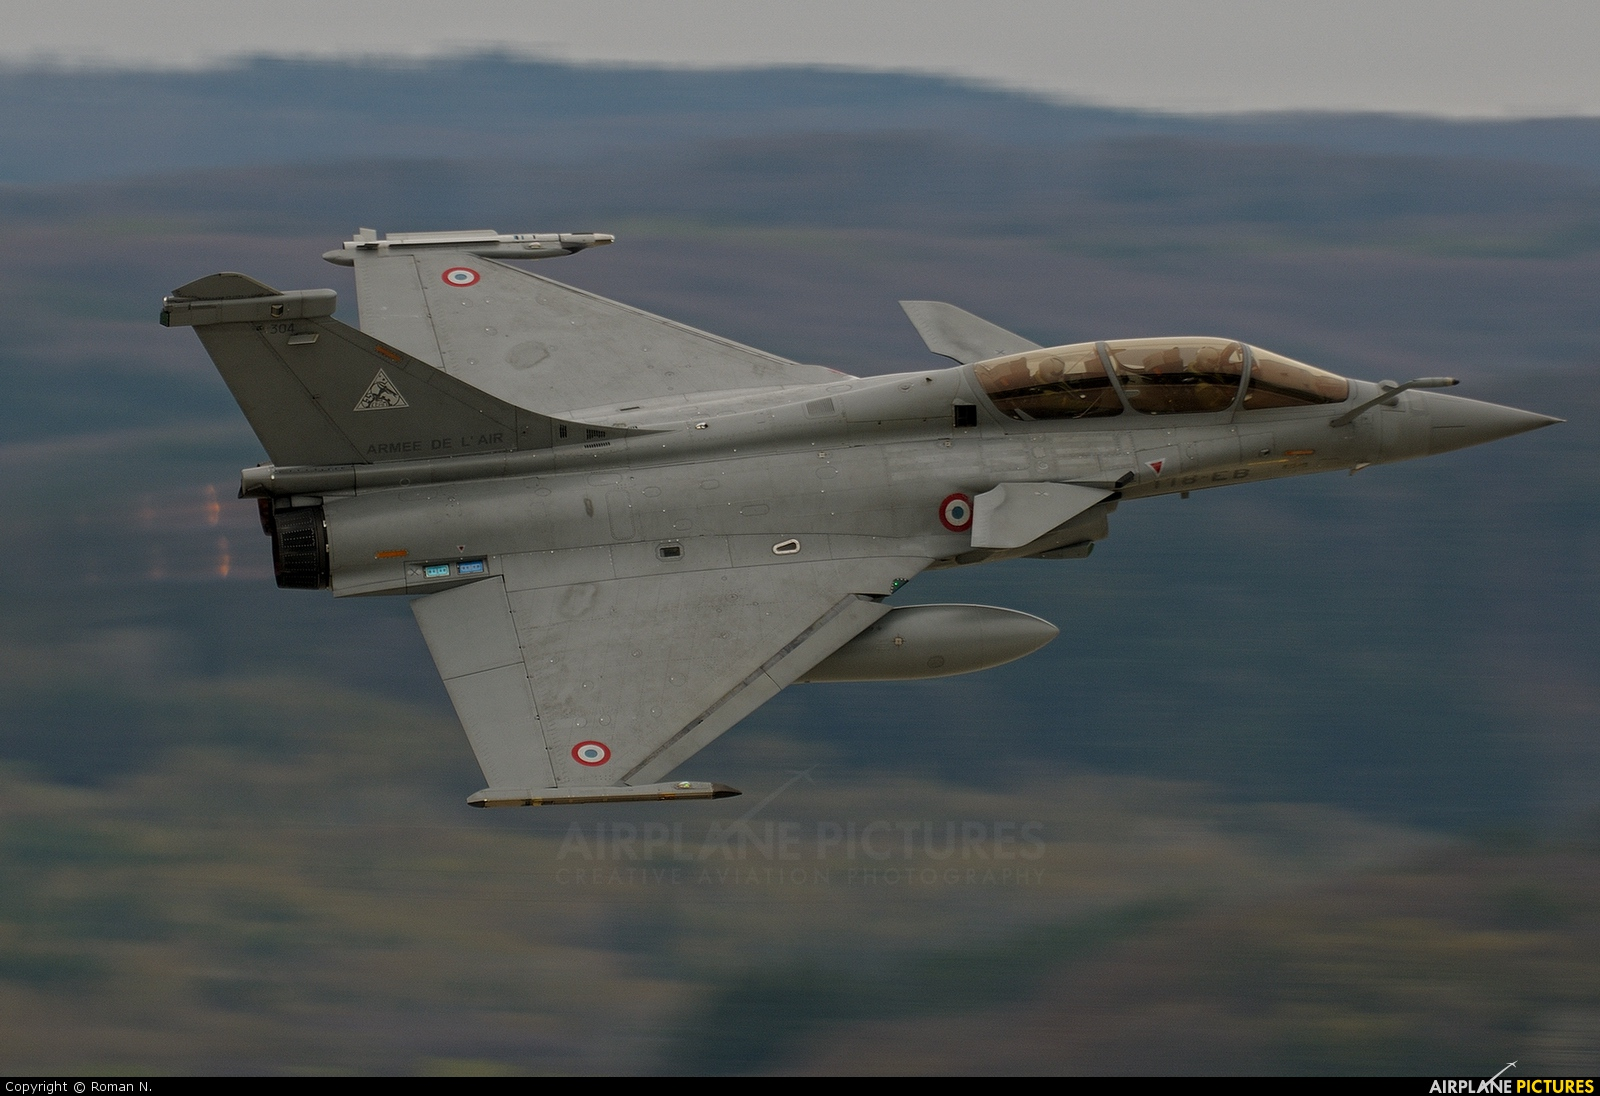 France - Air Force 304 aircraft at Sliač